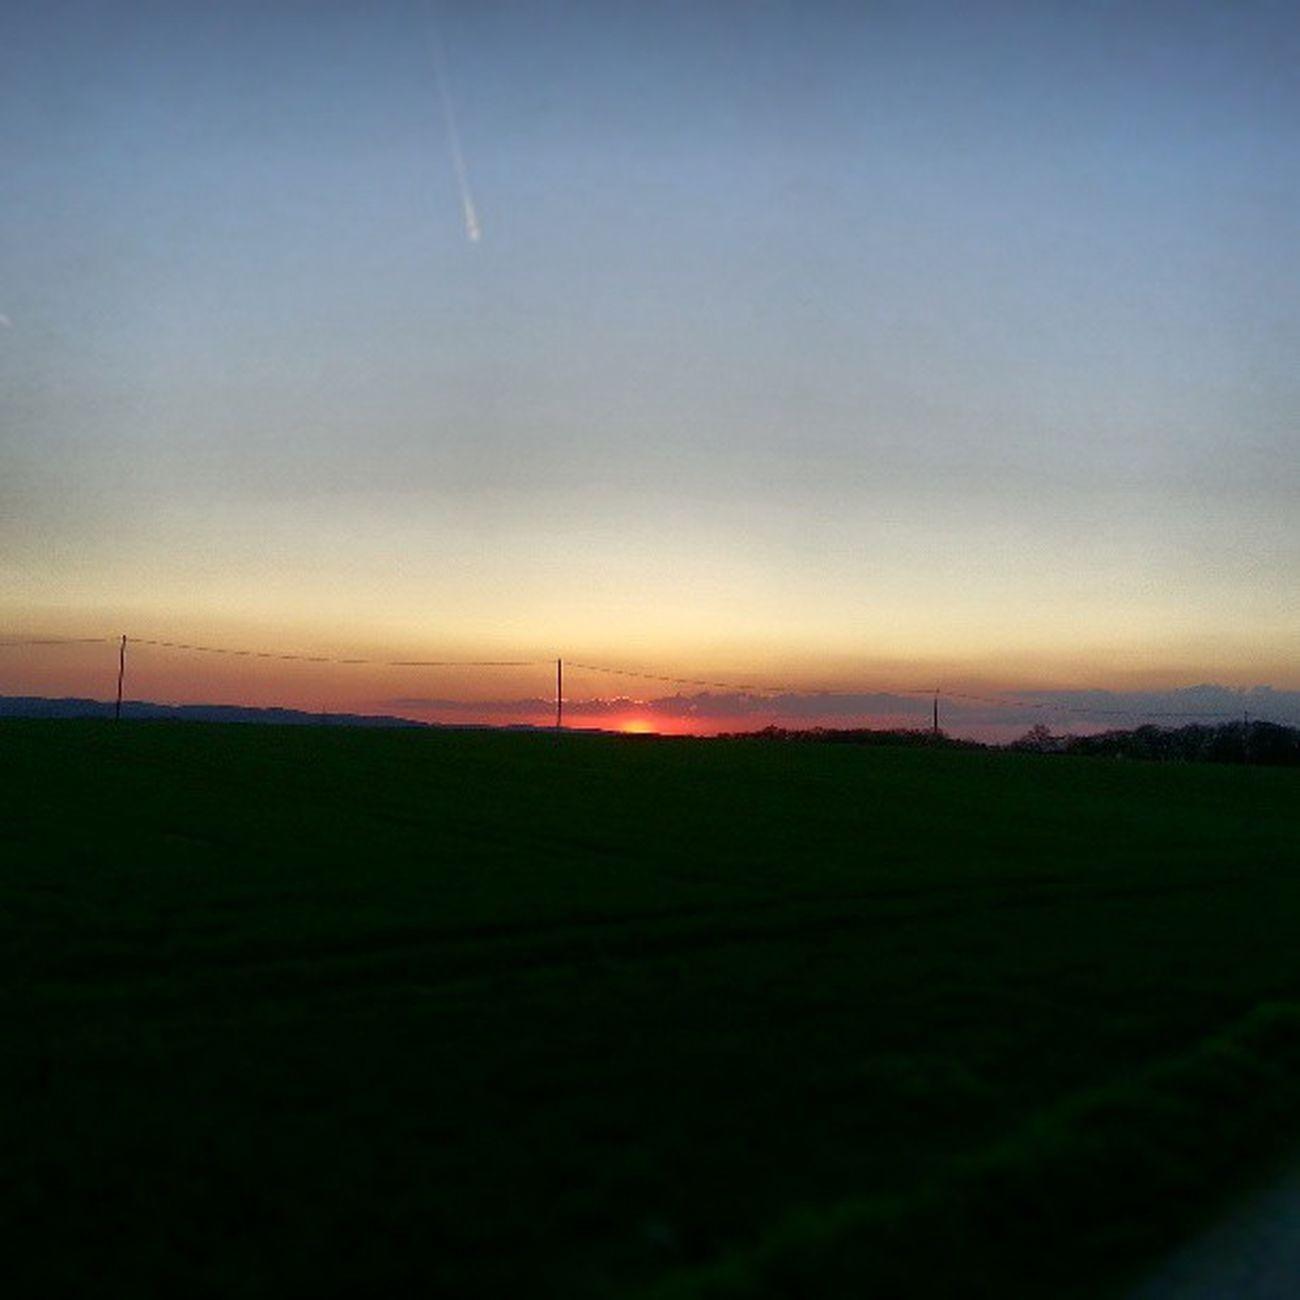 #igerskoblenz #rheinstagram #Koblenz #igers #instajogger #sunrise #germany Sunrise Germany Koblenz Igers Rheinstagram Igerskoblenz Instajogger